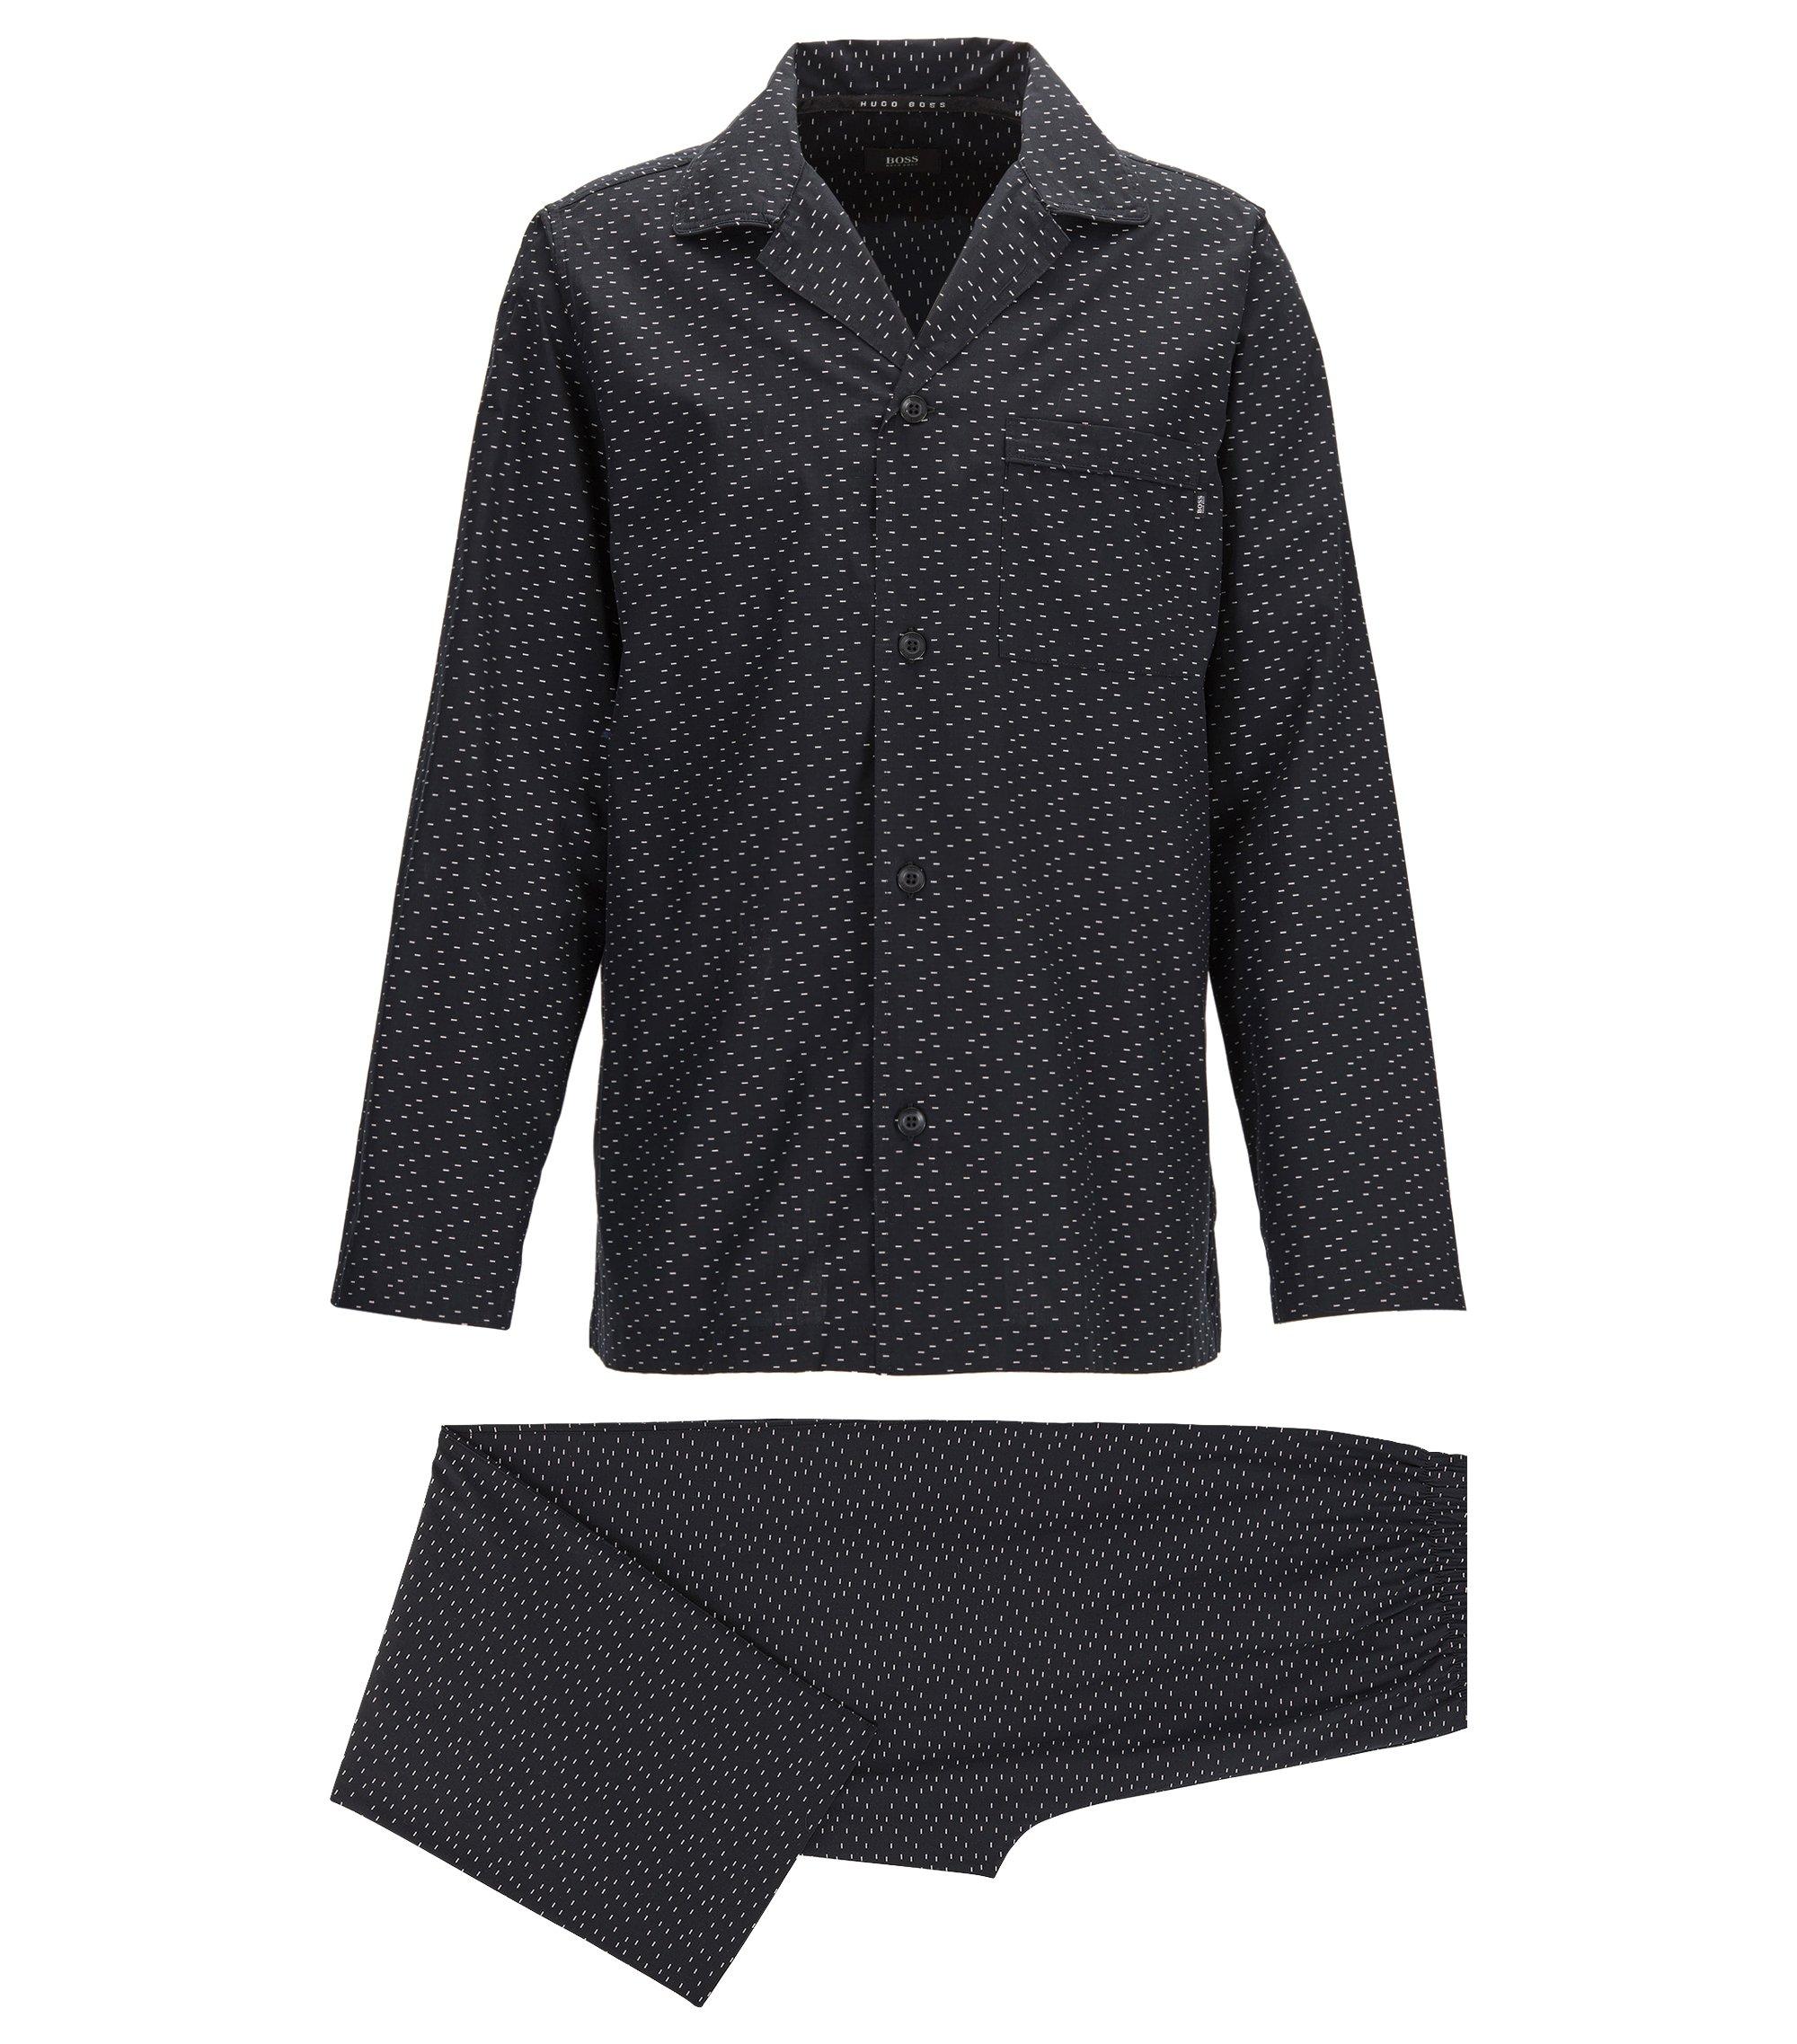 Pyjama aus Baumwolle mit Fil-coupé-Struktur, Schwarz